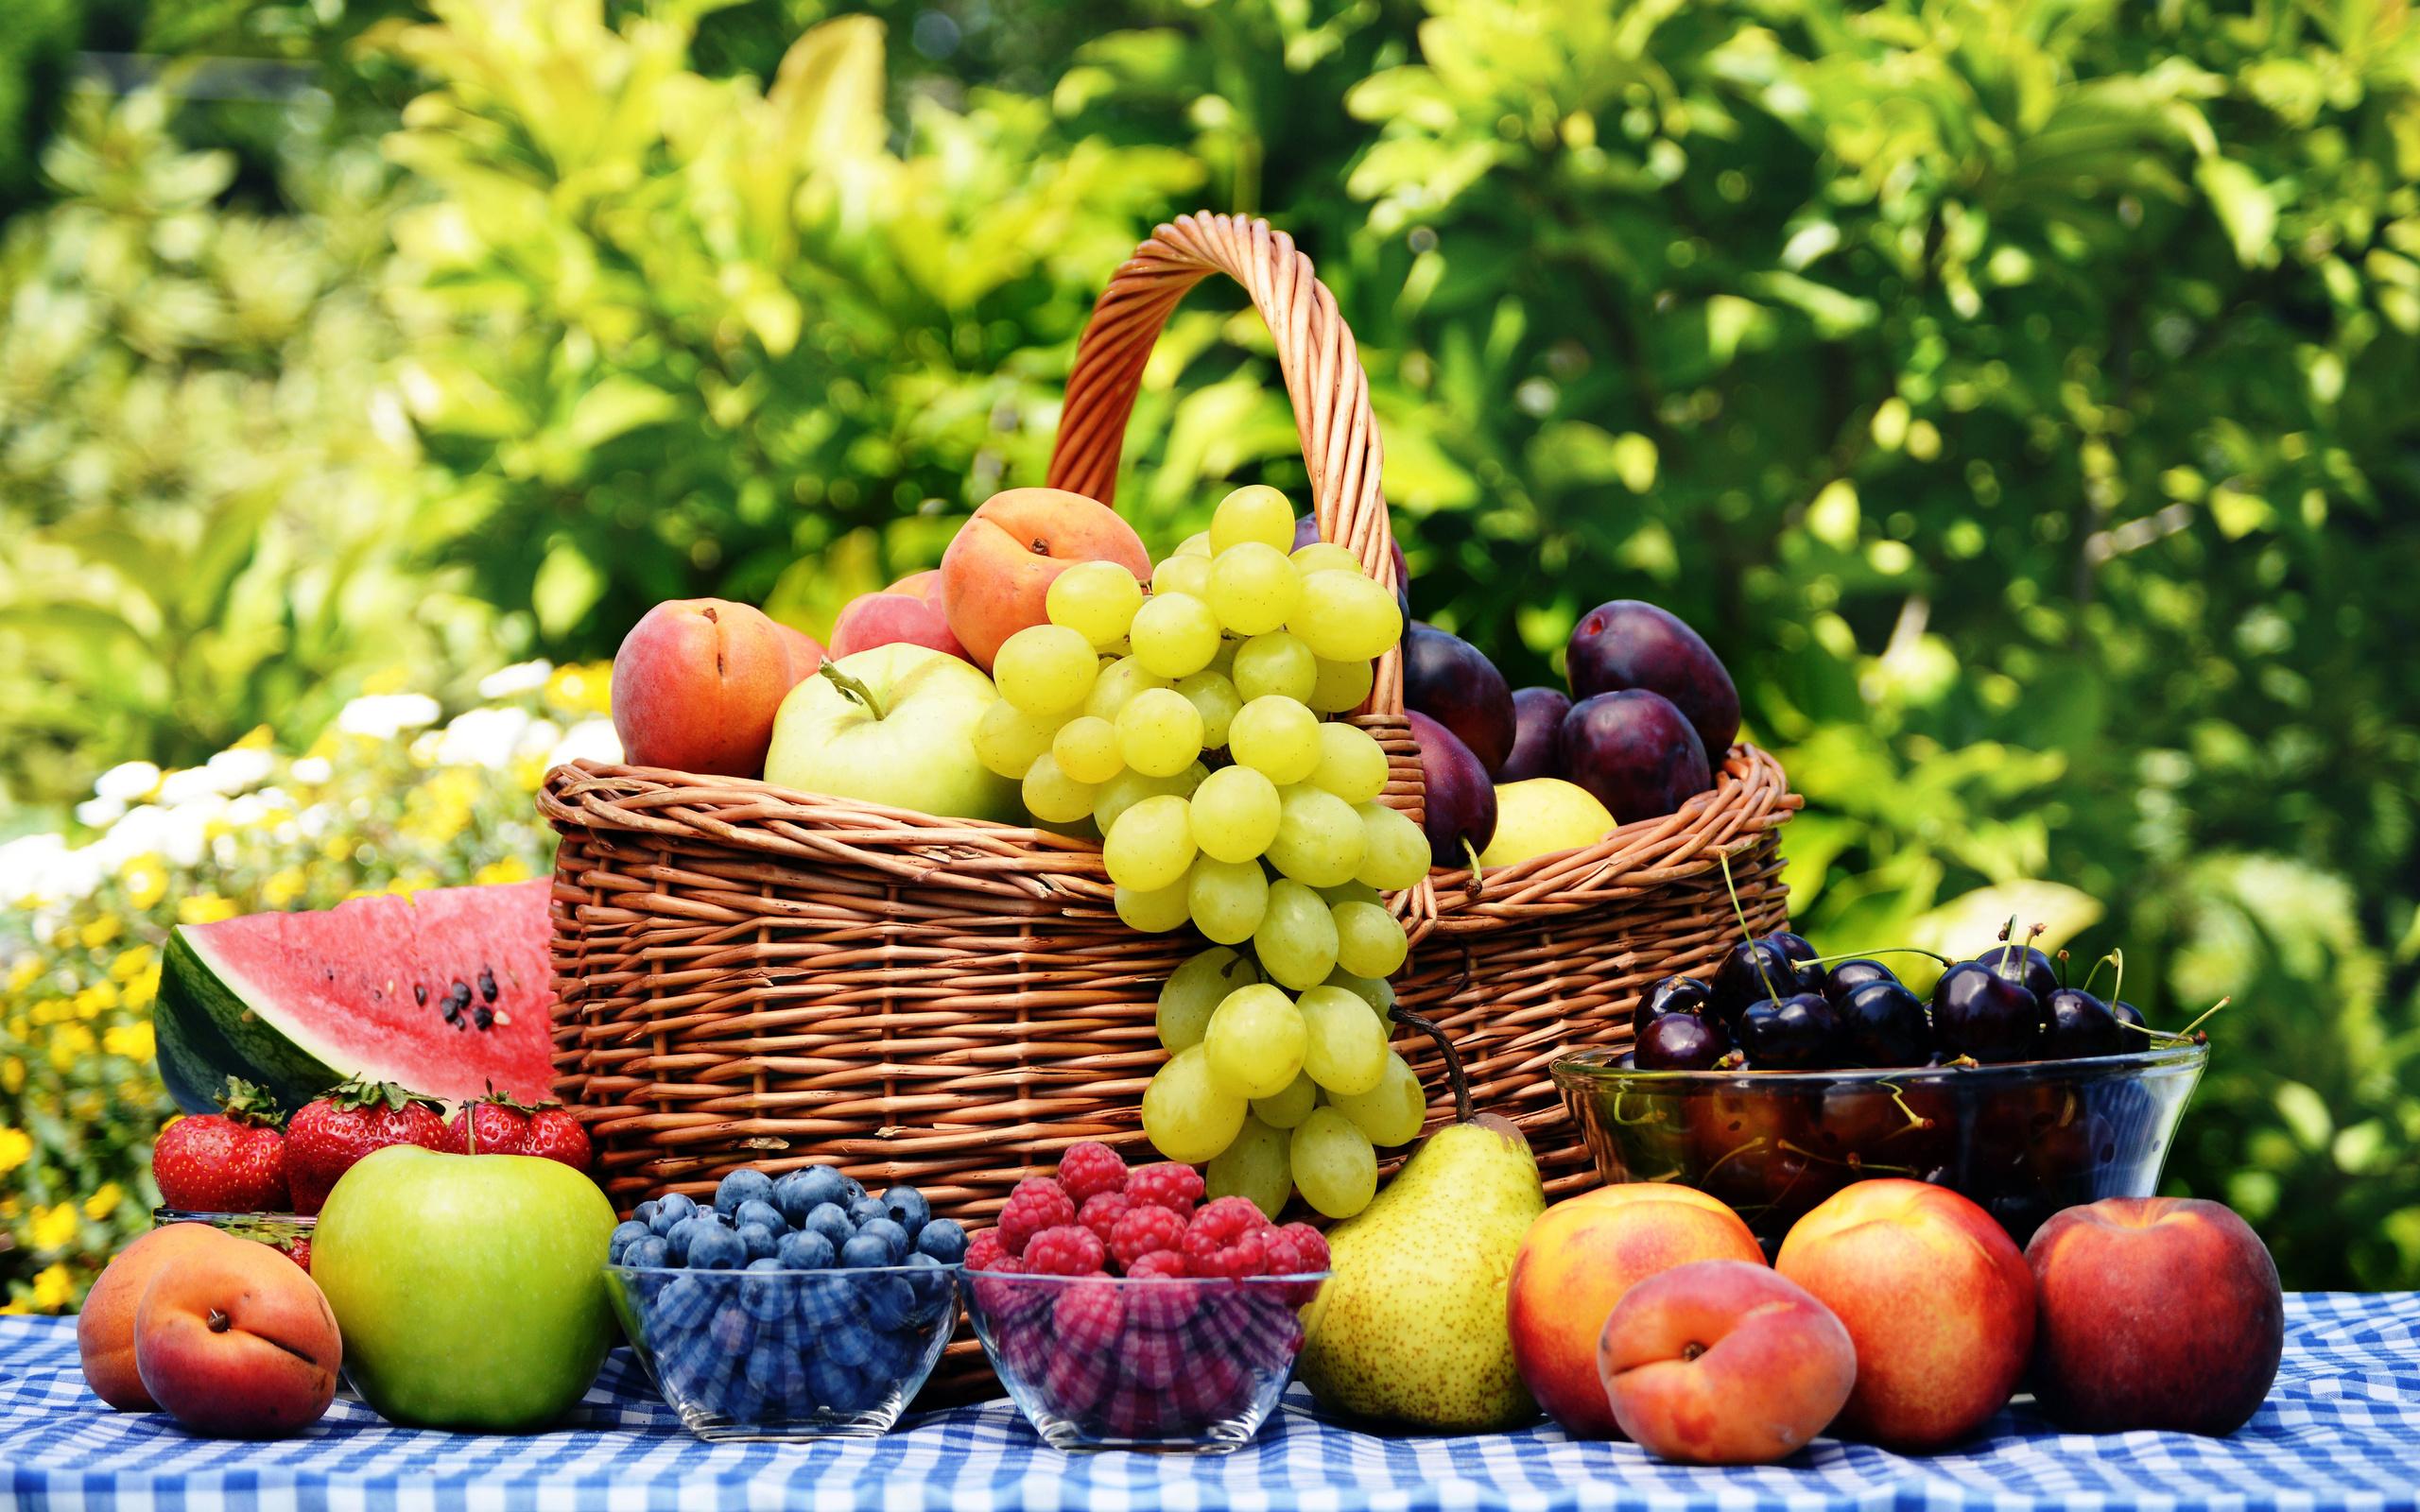 фрукты, корзина, виноград